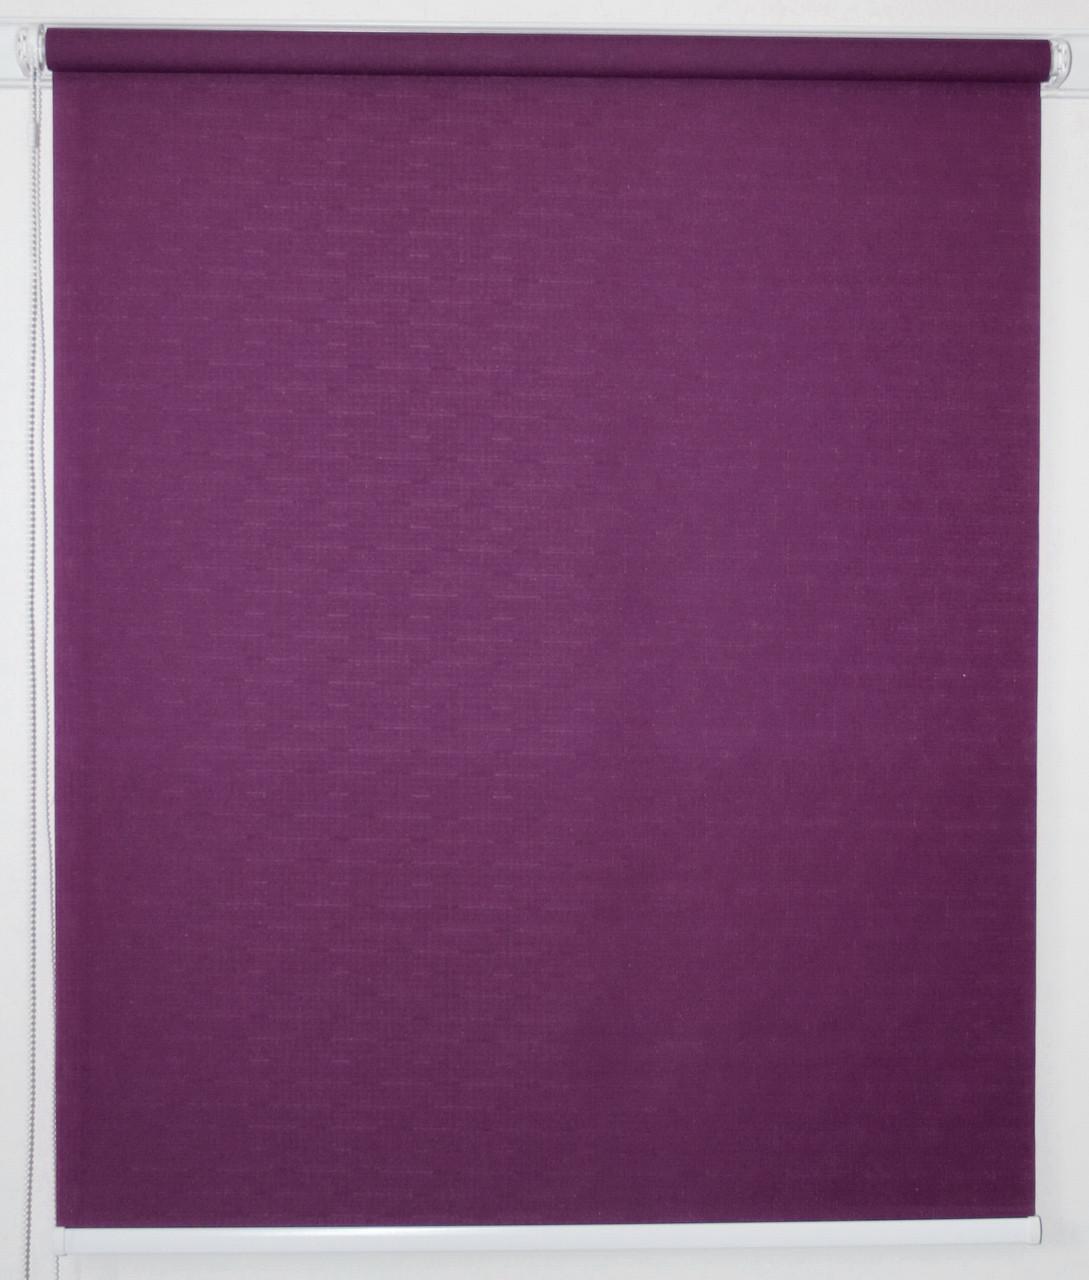 Рулонная штора 1450*1500 Лён 613 Фиолетовый